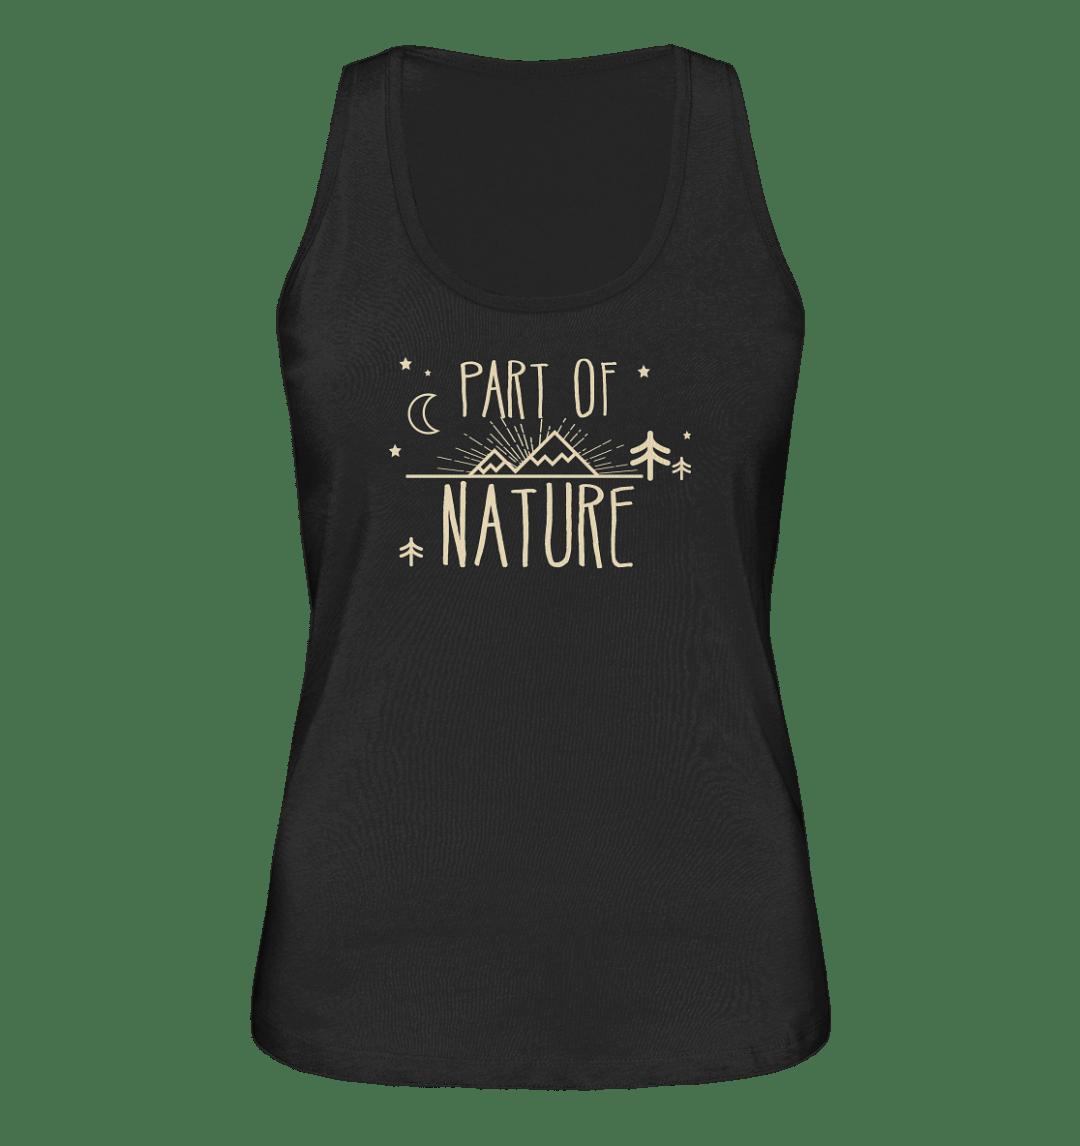 Part Of Nature. Bio Baumwoll Damen Tank Top in verschiedenen Farben